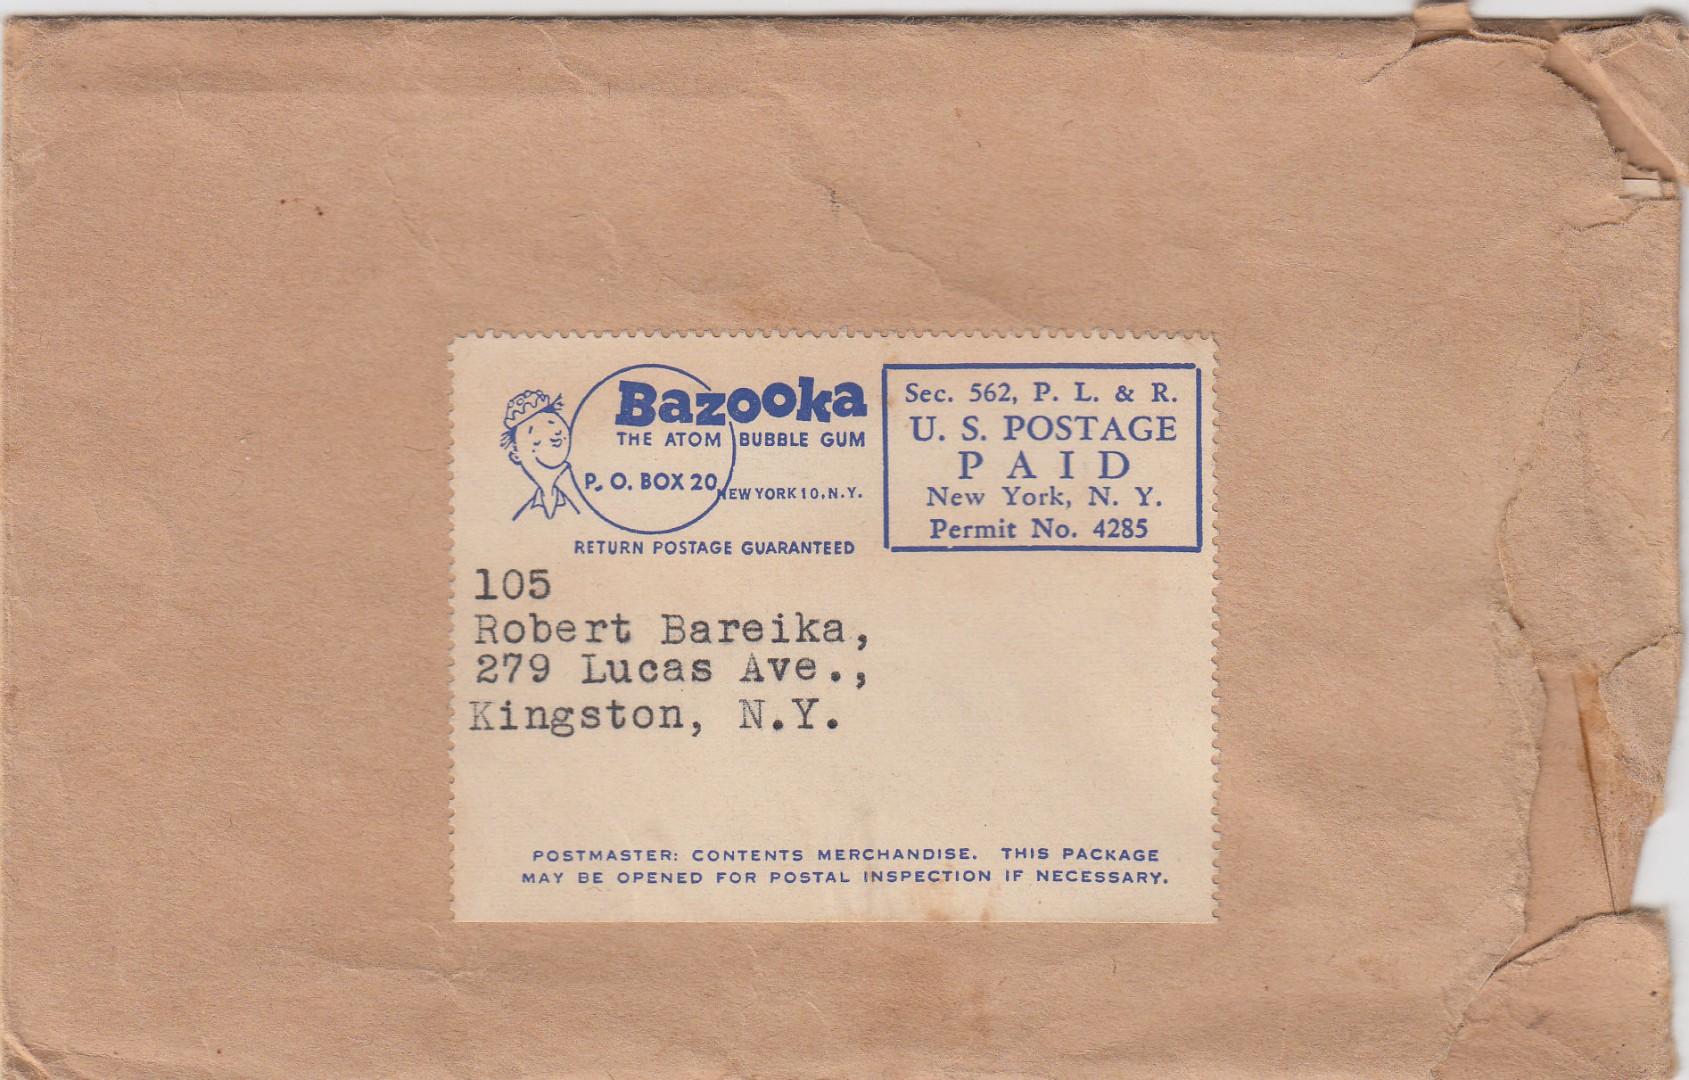 Bazooka Envelope Mine.jpg